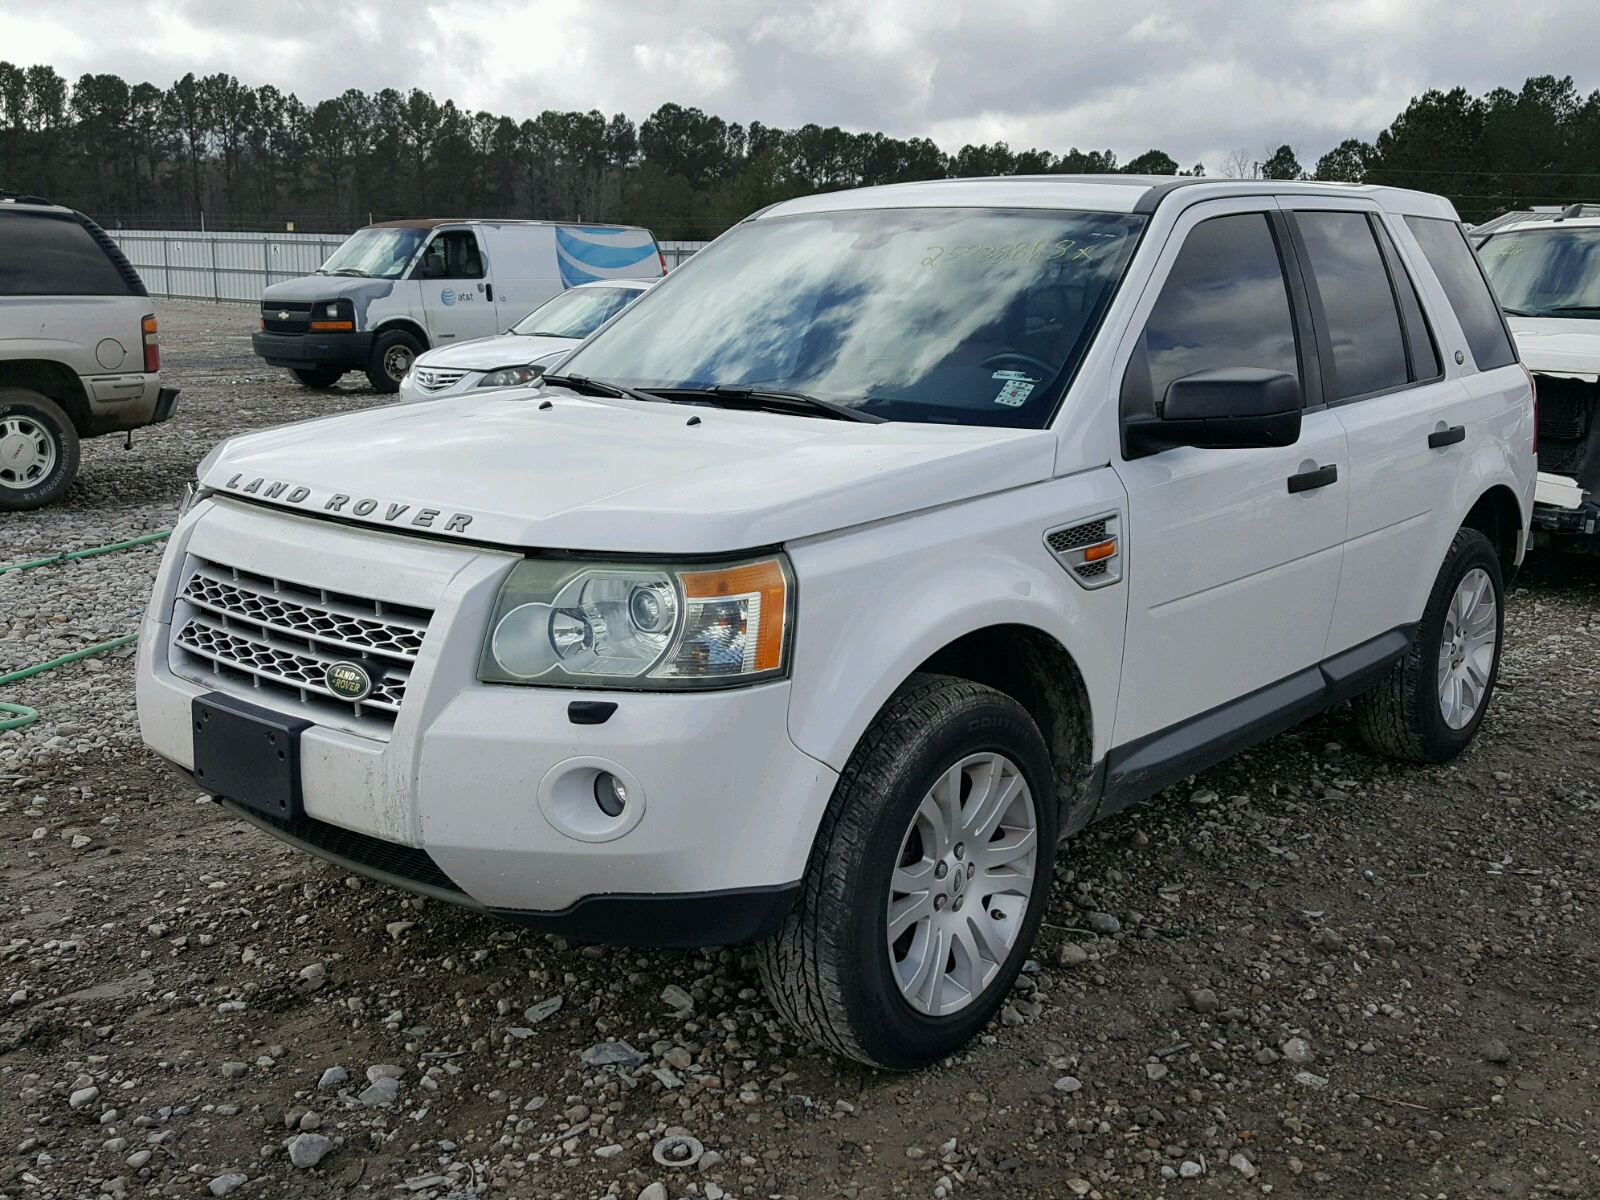 rover sale tec se online landrover lot auctions auction for savannah auto vehicle ga land on carfinder copart vin salvage title en ended